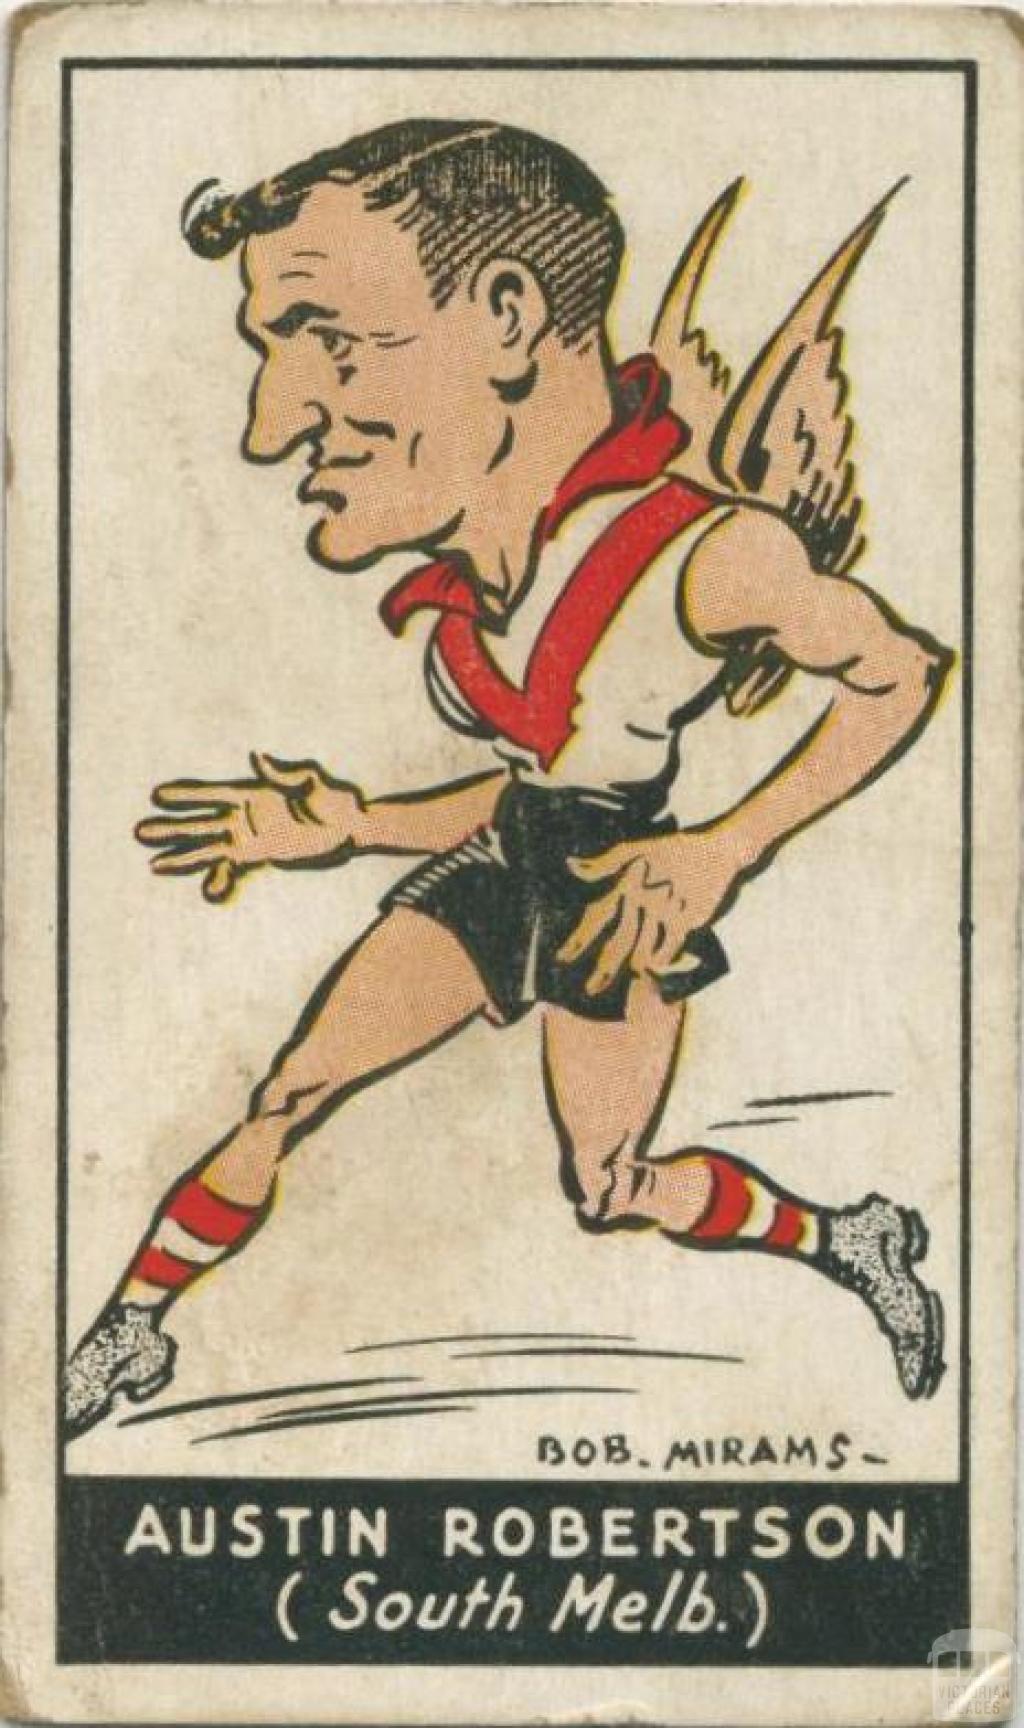 Austin Robertson, South Melbourne Football Club, Standard Cigarettes Card